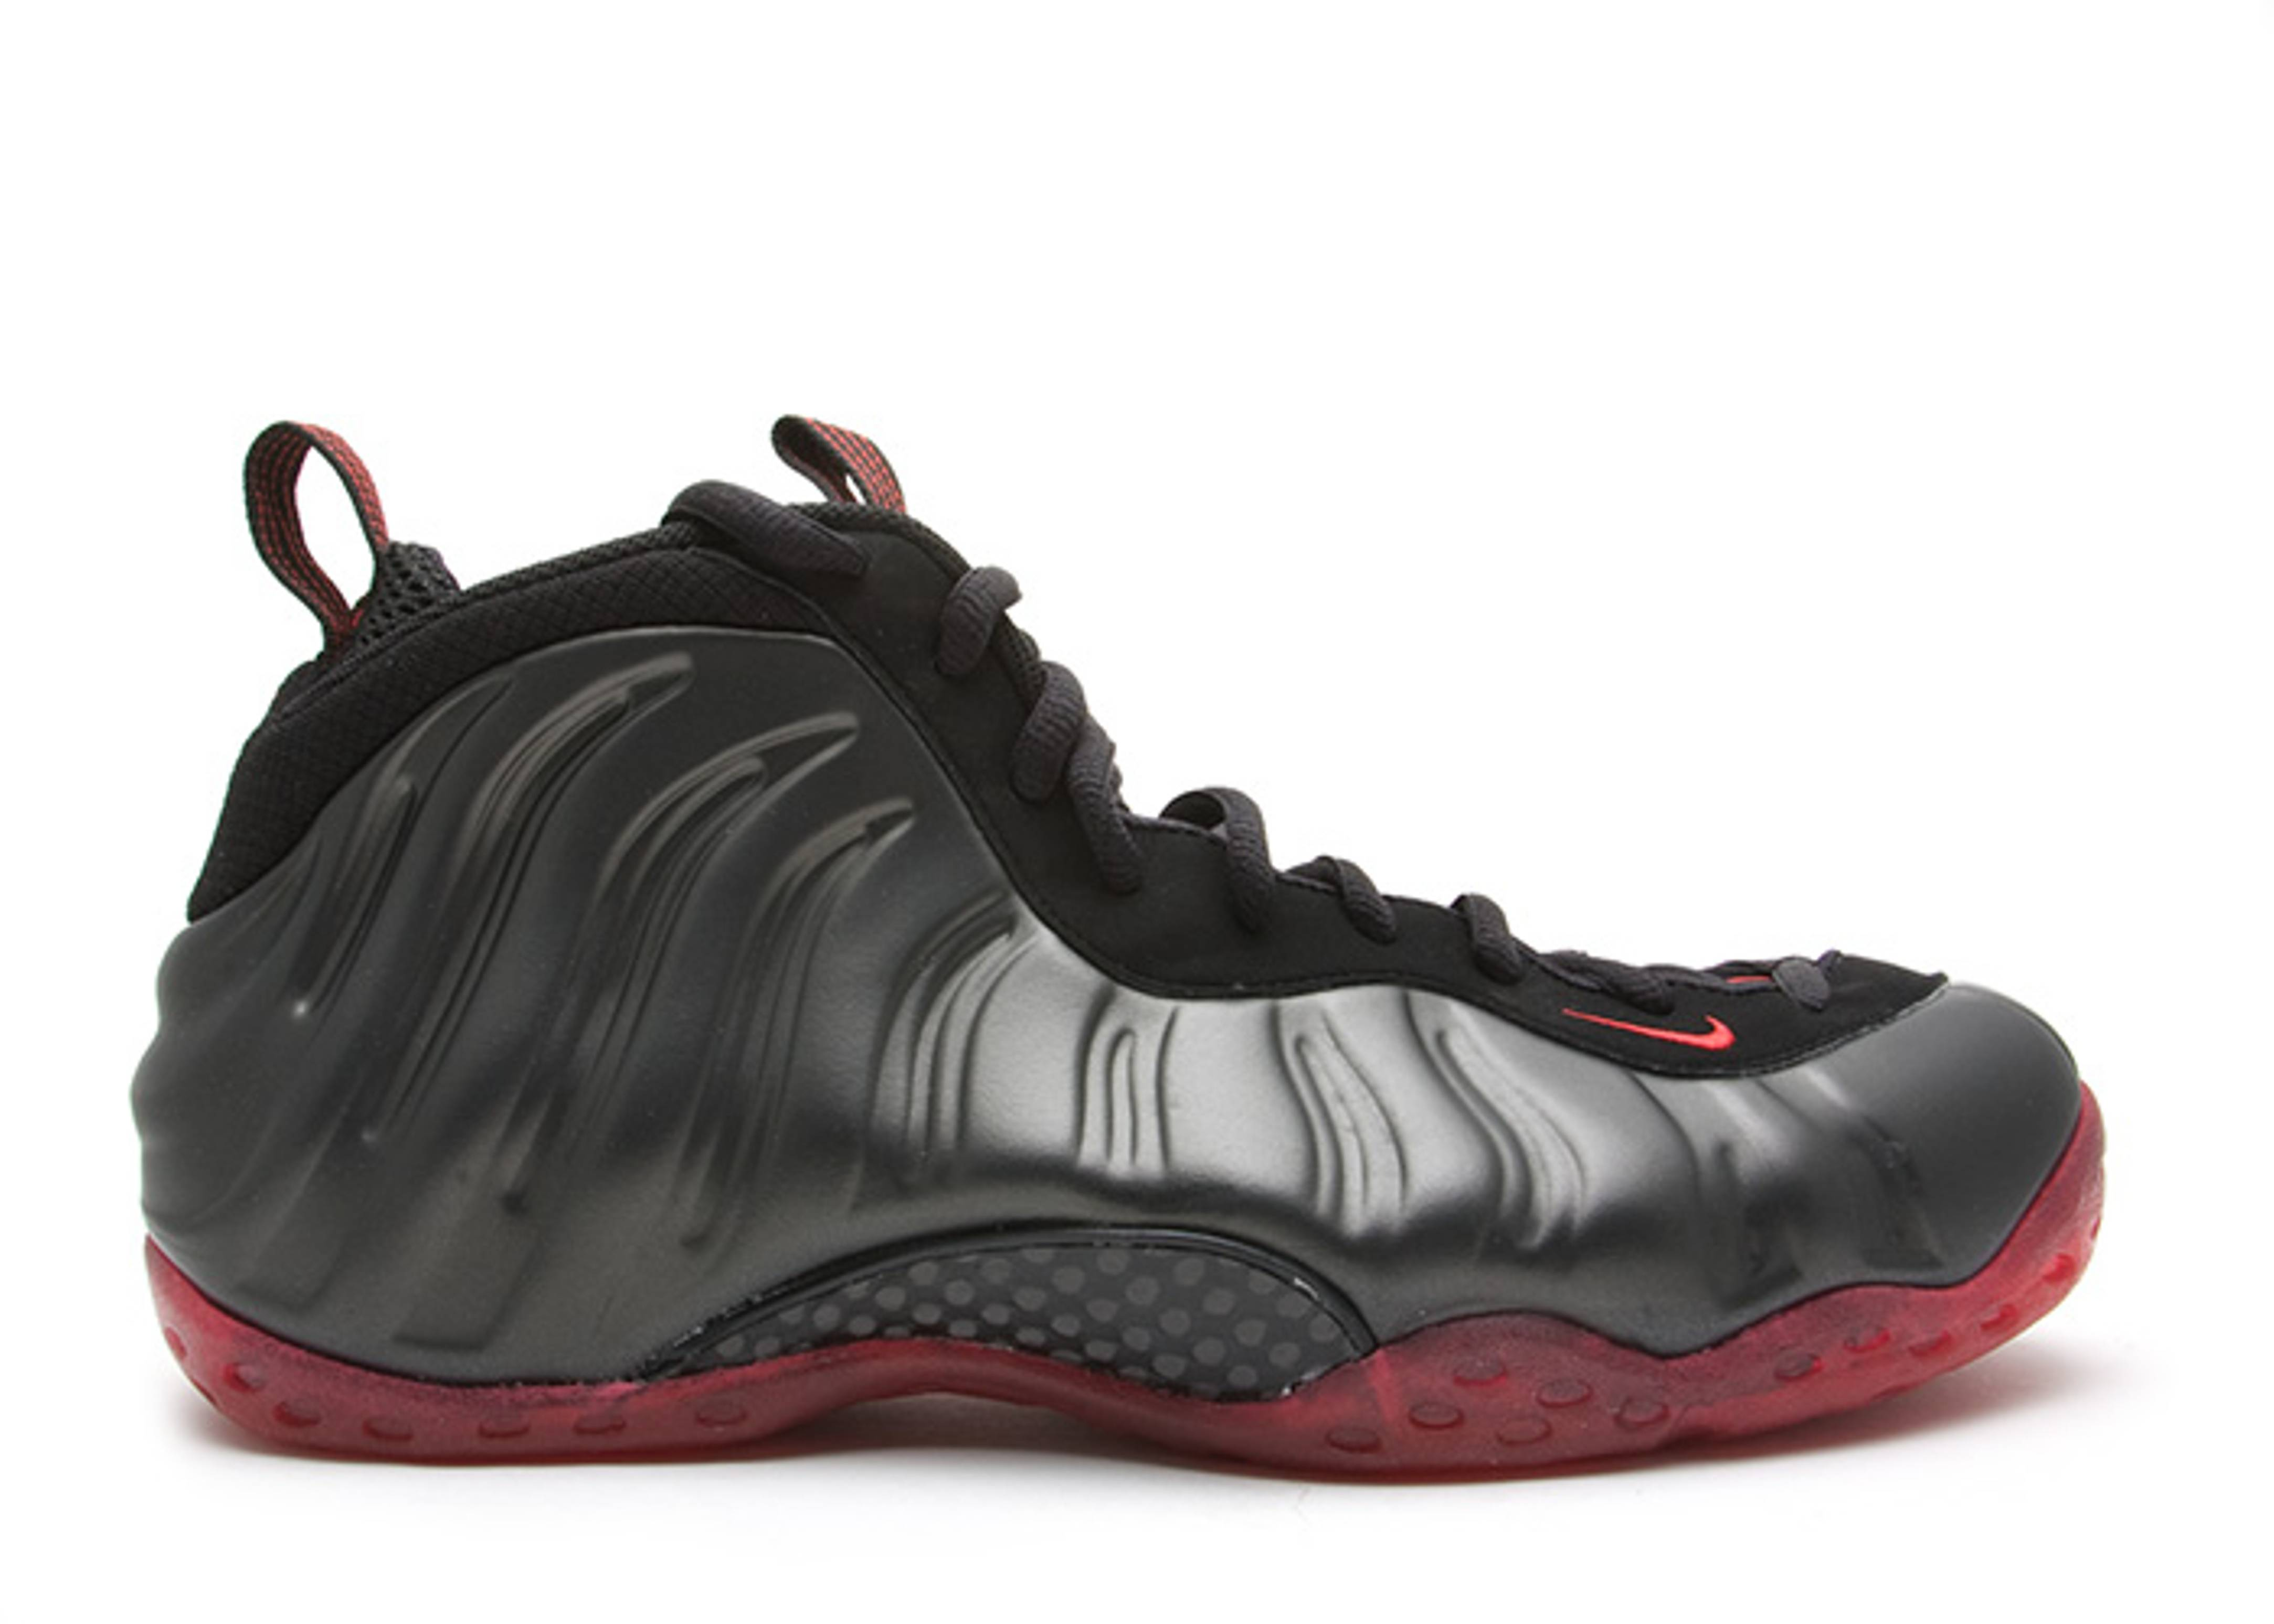 Sneaker Talk: Nike Air Foamposite One Weatherman?